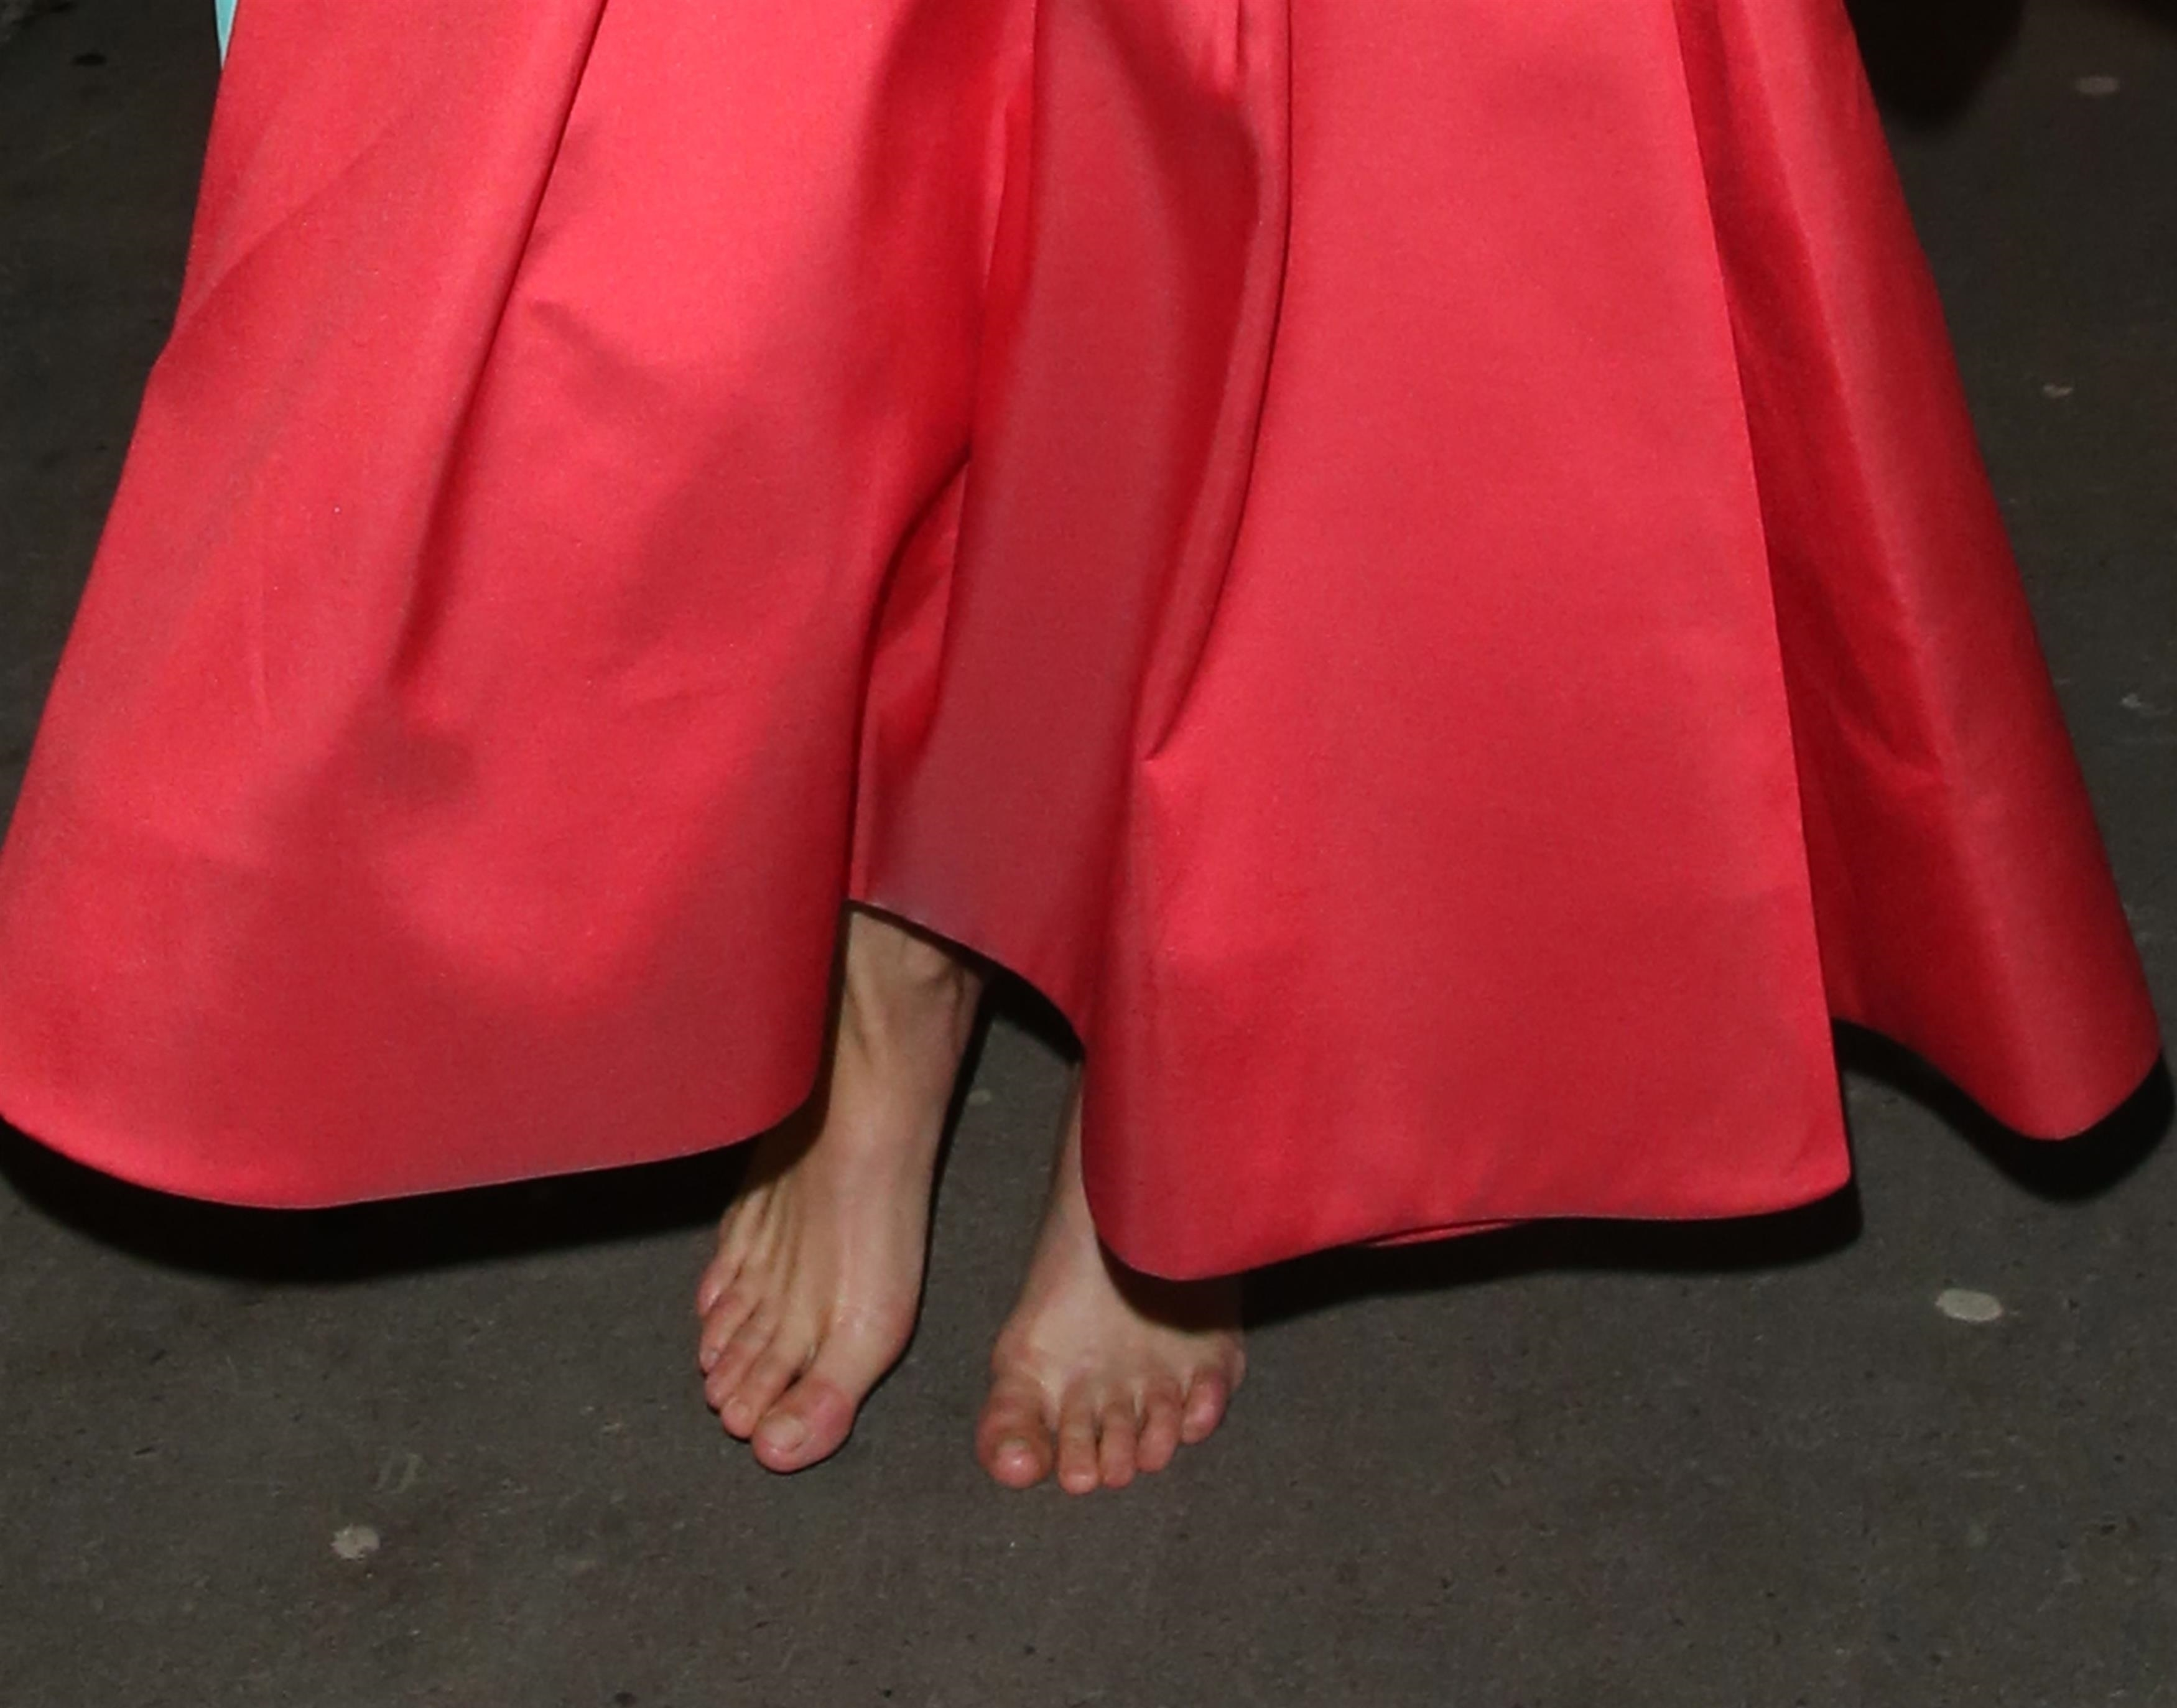 https://pics.wikifeet.com/Michelle-Rodriguez-Feet-4014826.jpg